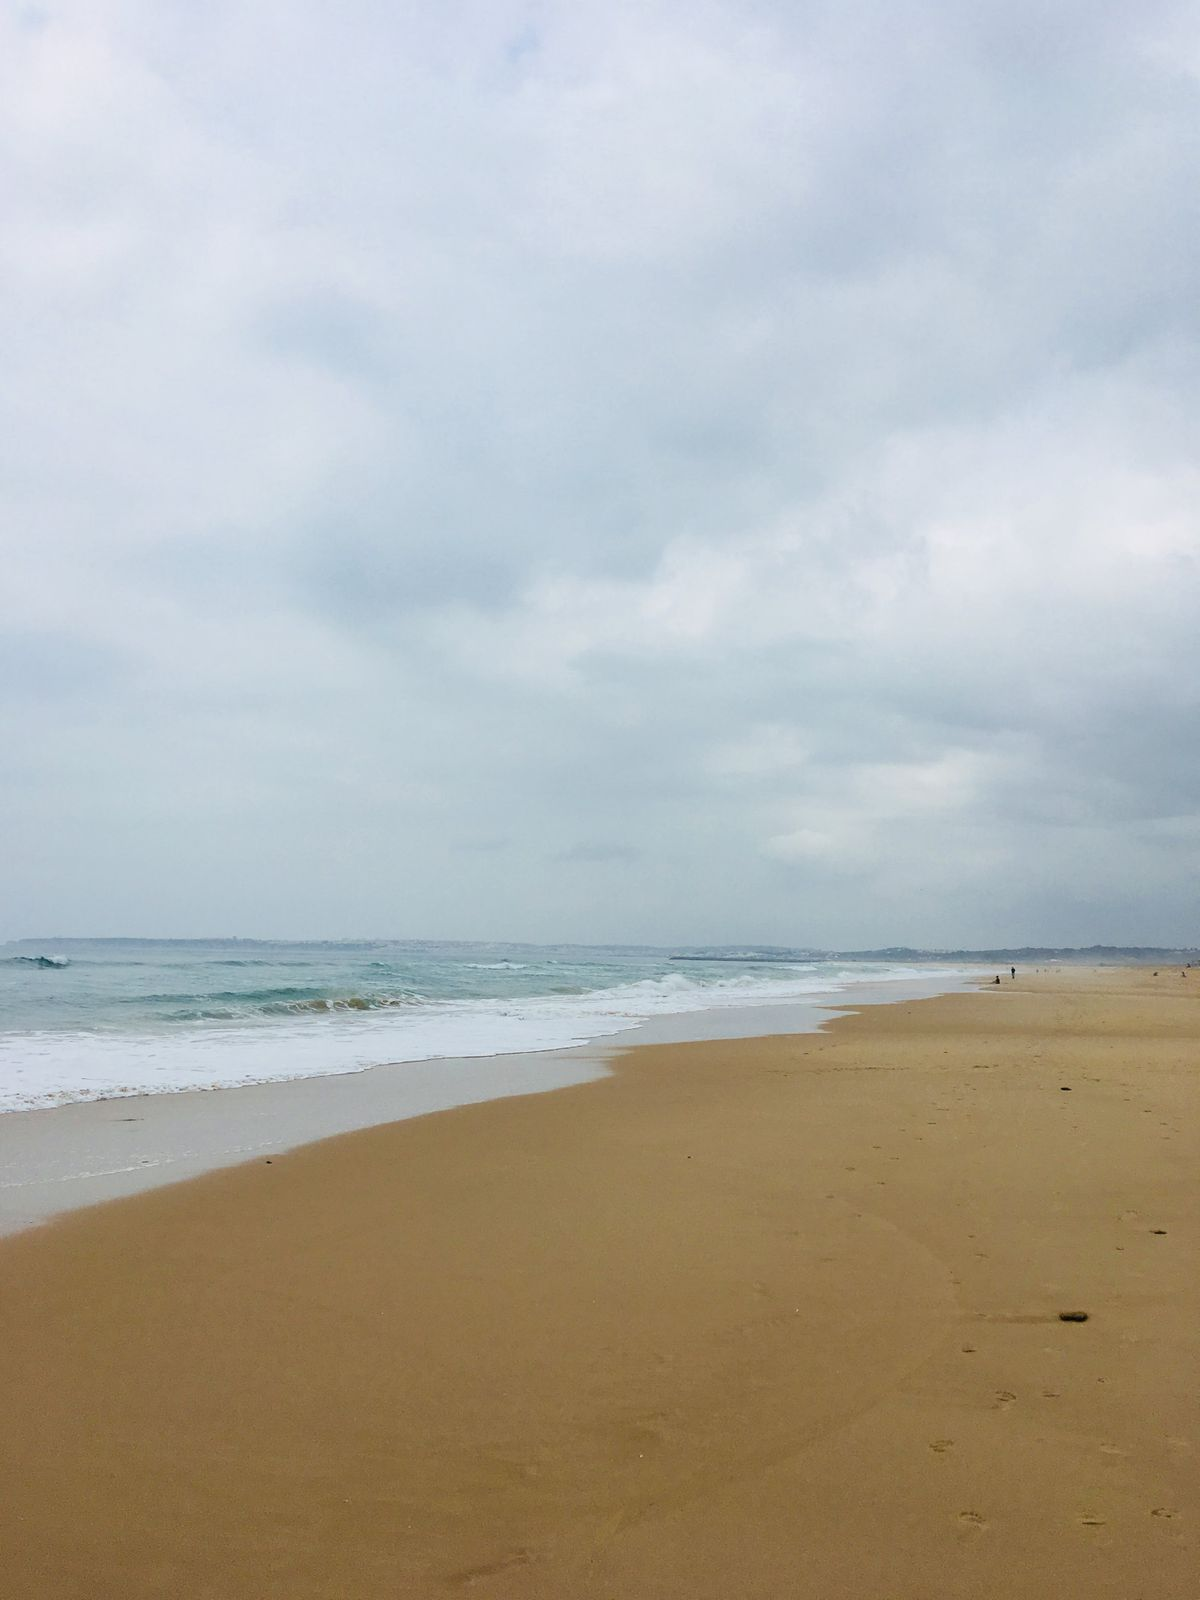 Végtelennek tűnő tengerpart